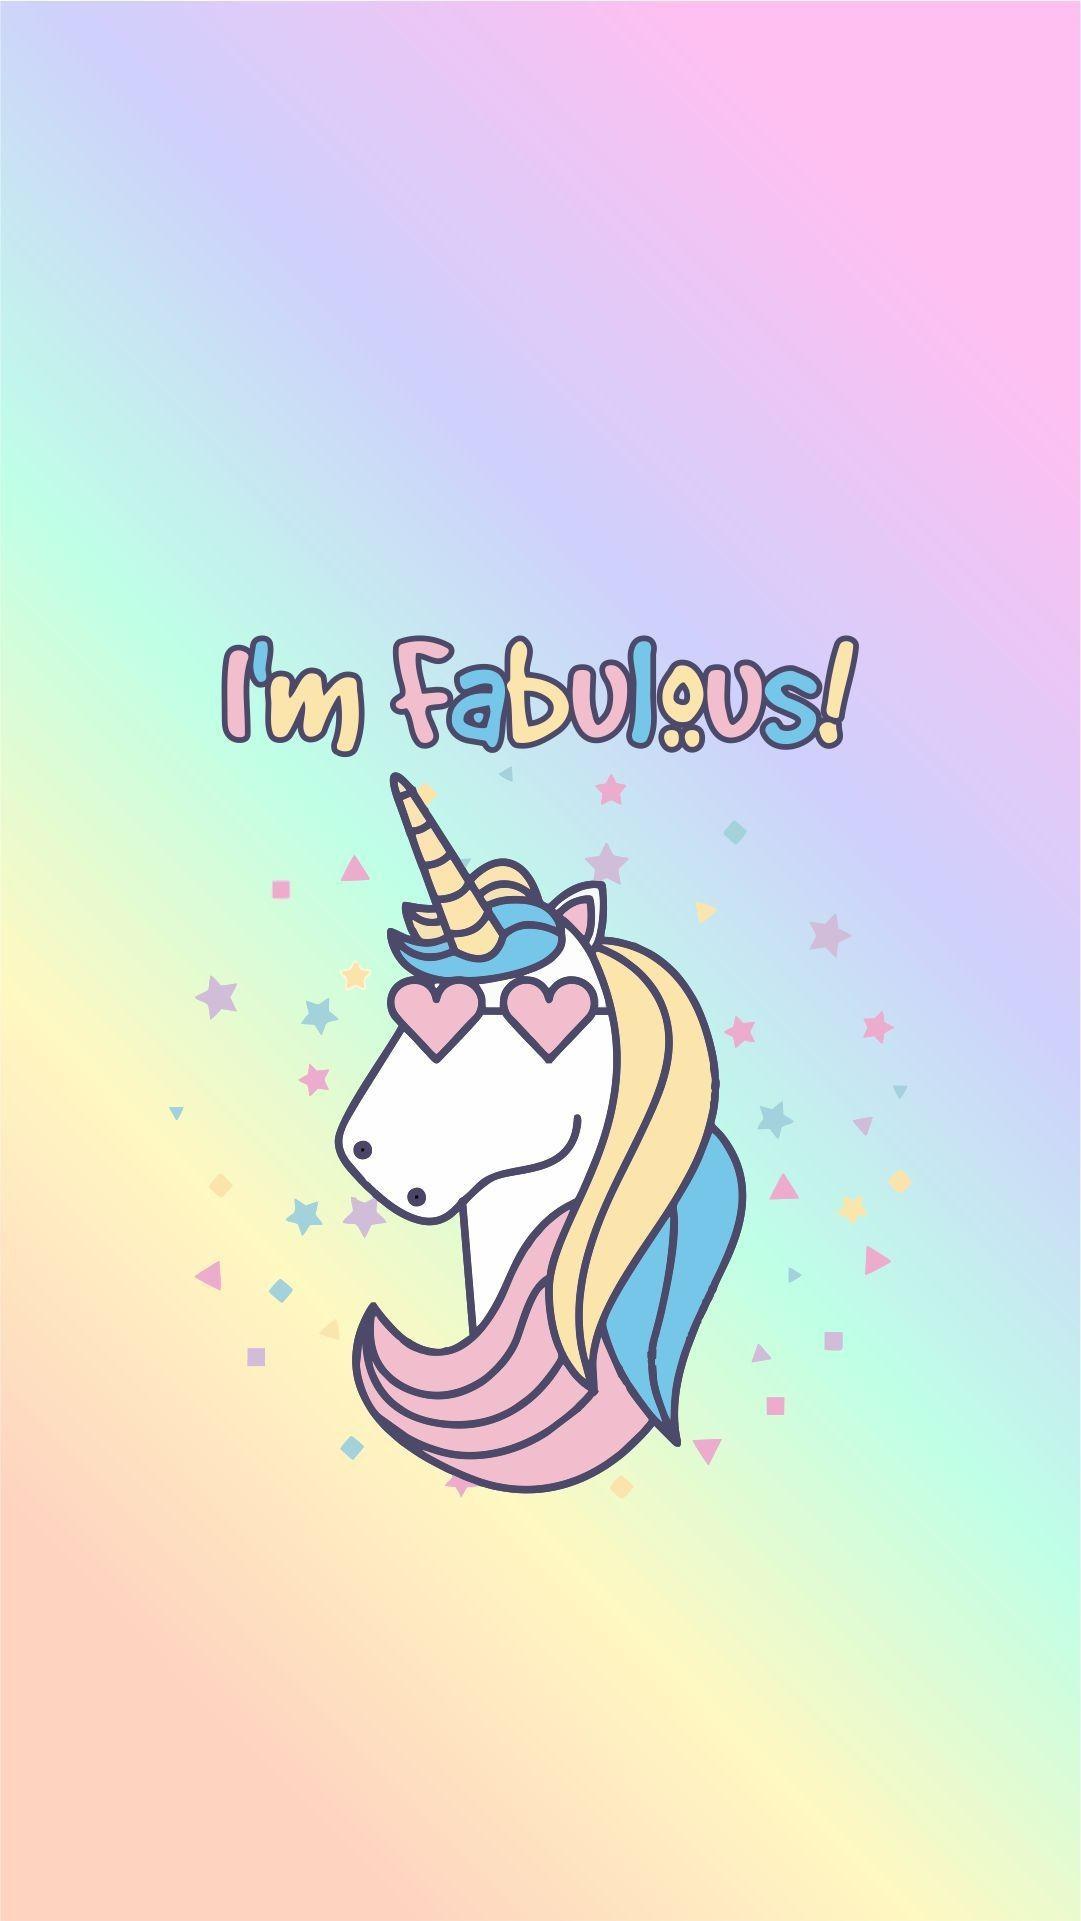 Res: 1081x1921, I'm Fabulous